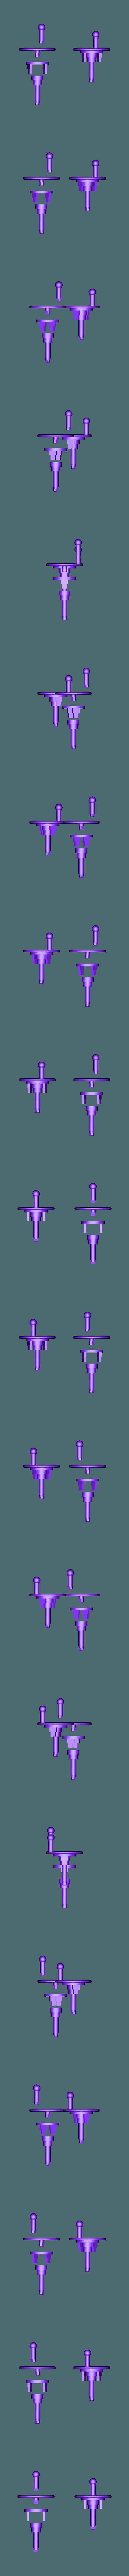 Assembly.stl Download free STL file Saber, Hand Crank Module • 3D printer model, gzumwalt